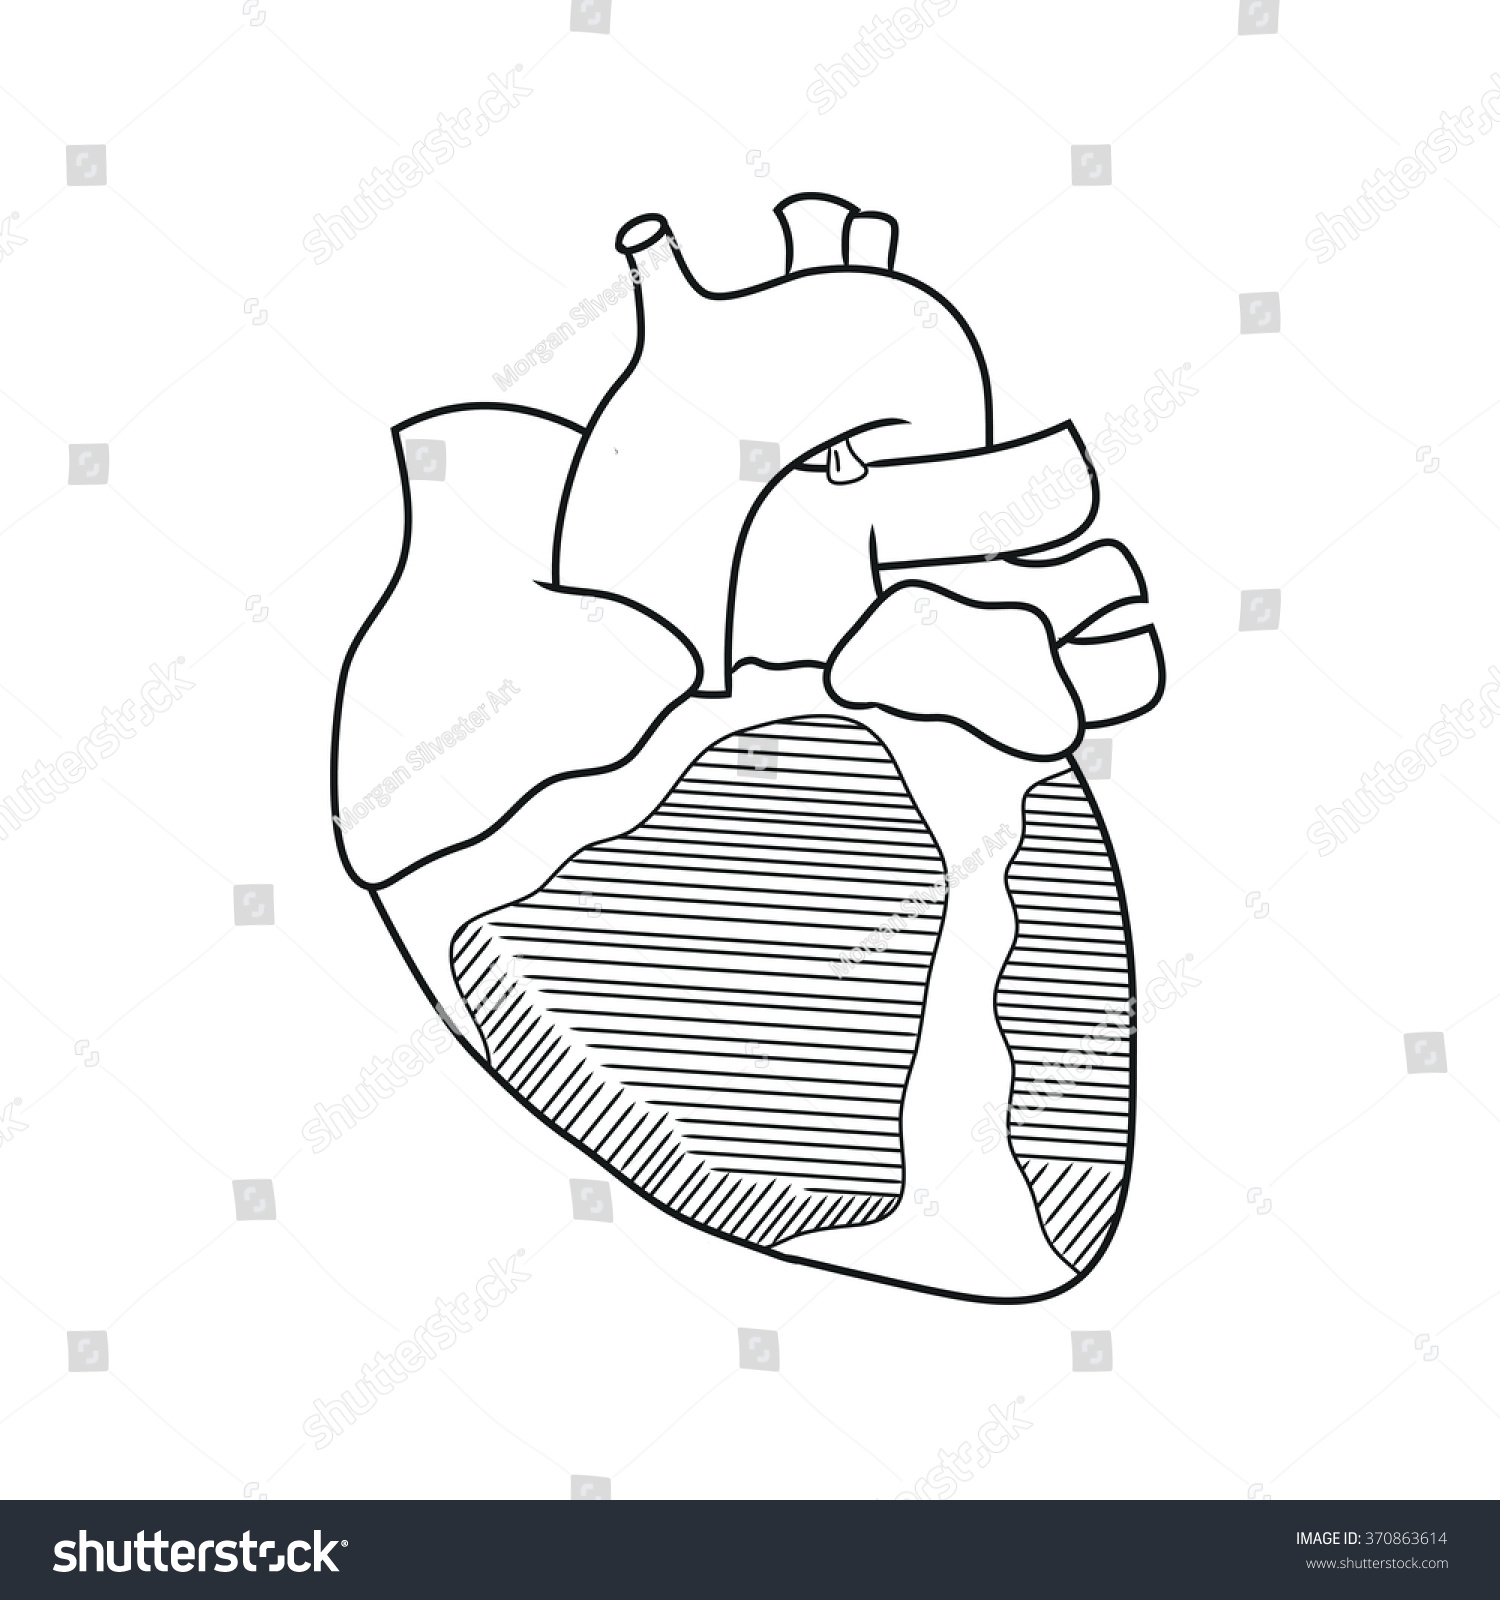 Anatomy Heart Anterior View Stock Illustration 370863614 - Shutterstock